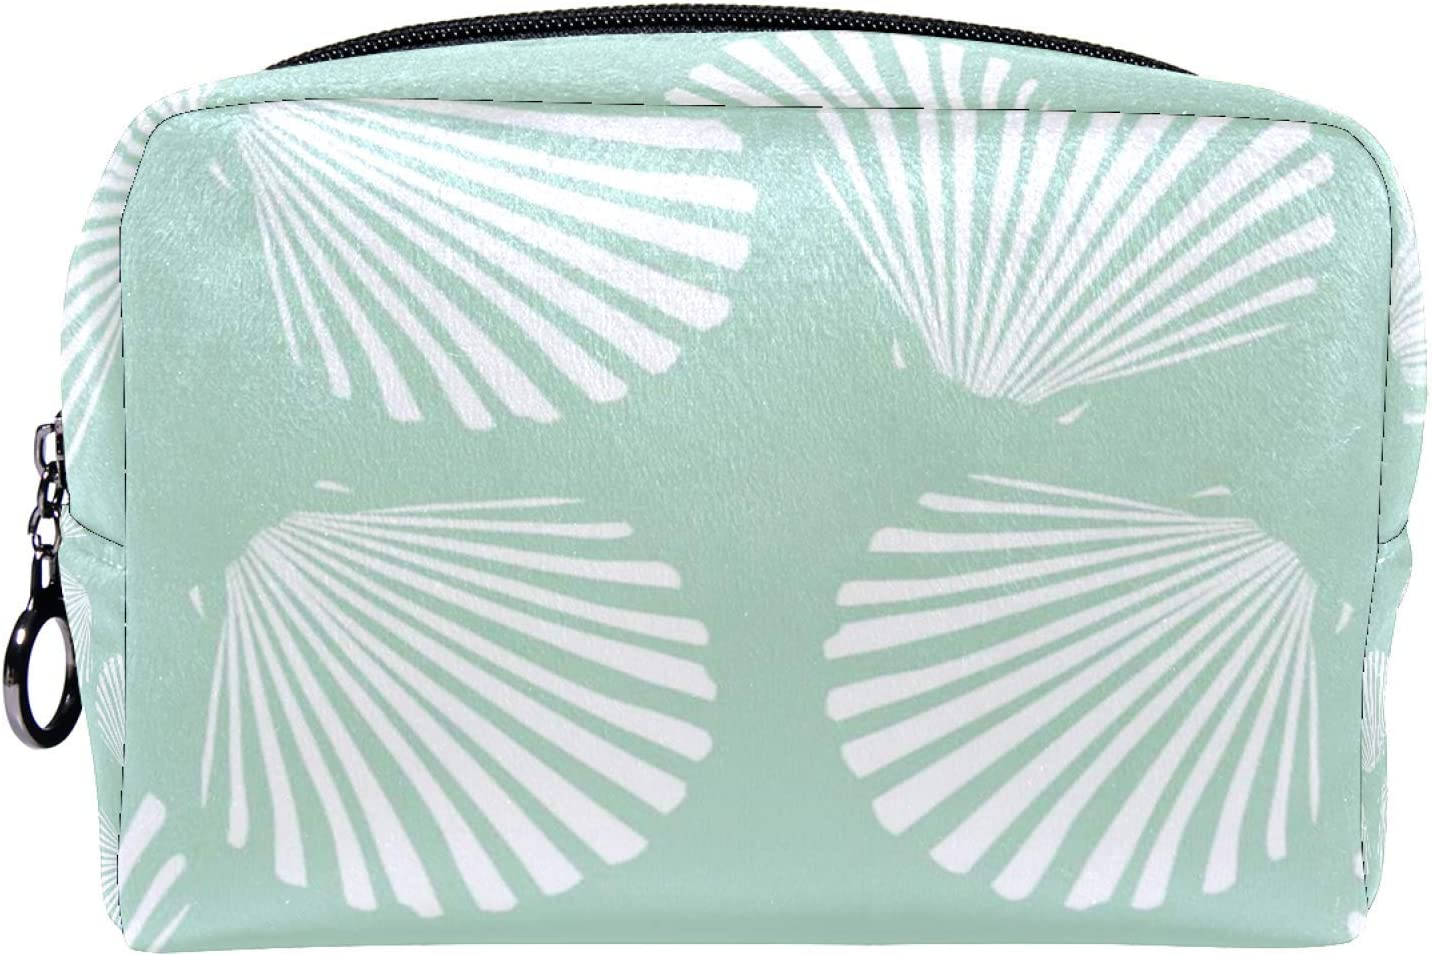 Makeup Toiletry Bag for Women Kit Organize Ranking TOP13 Travel Cosmetic Regular discount Purse